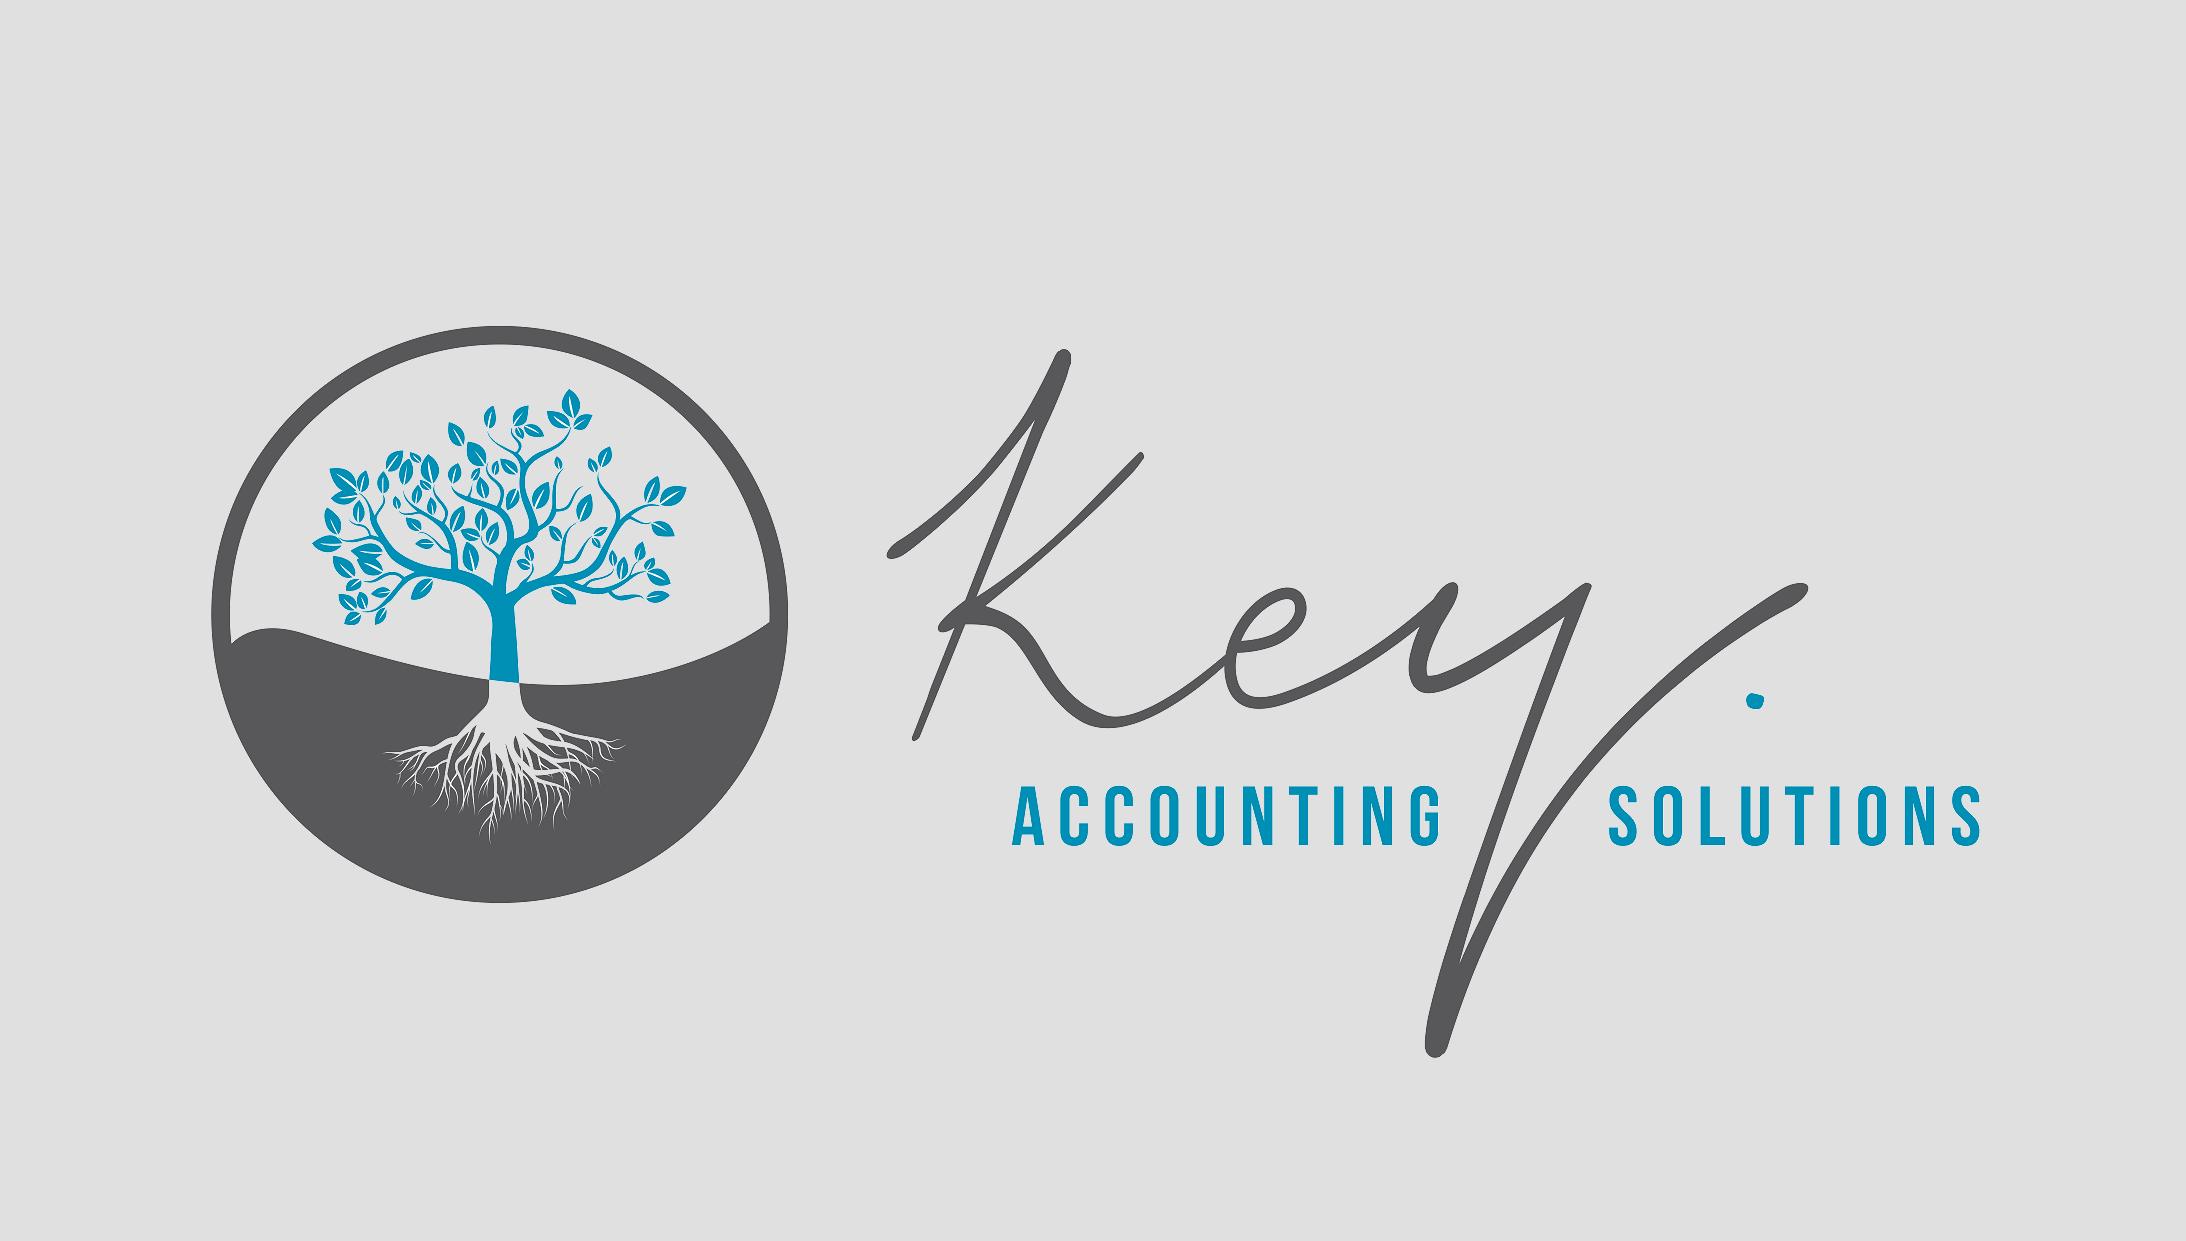 Home Page [keyaccountingsolutions.co.za]